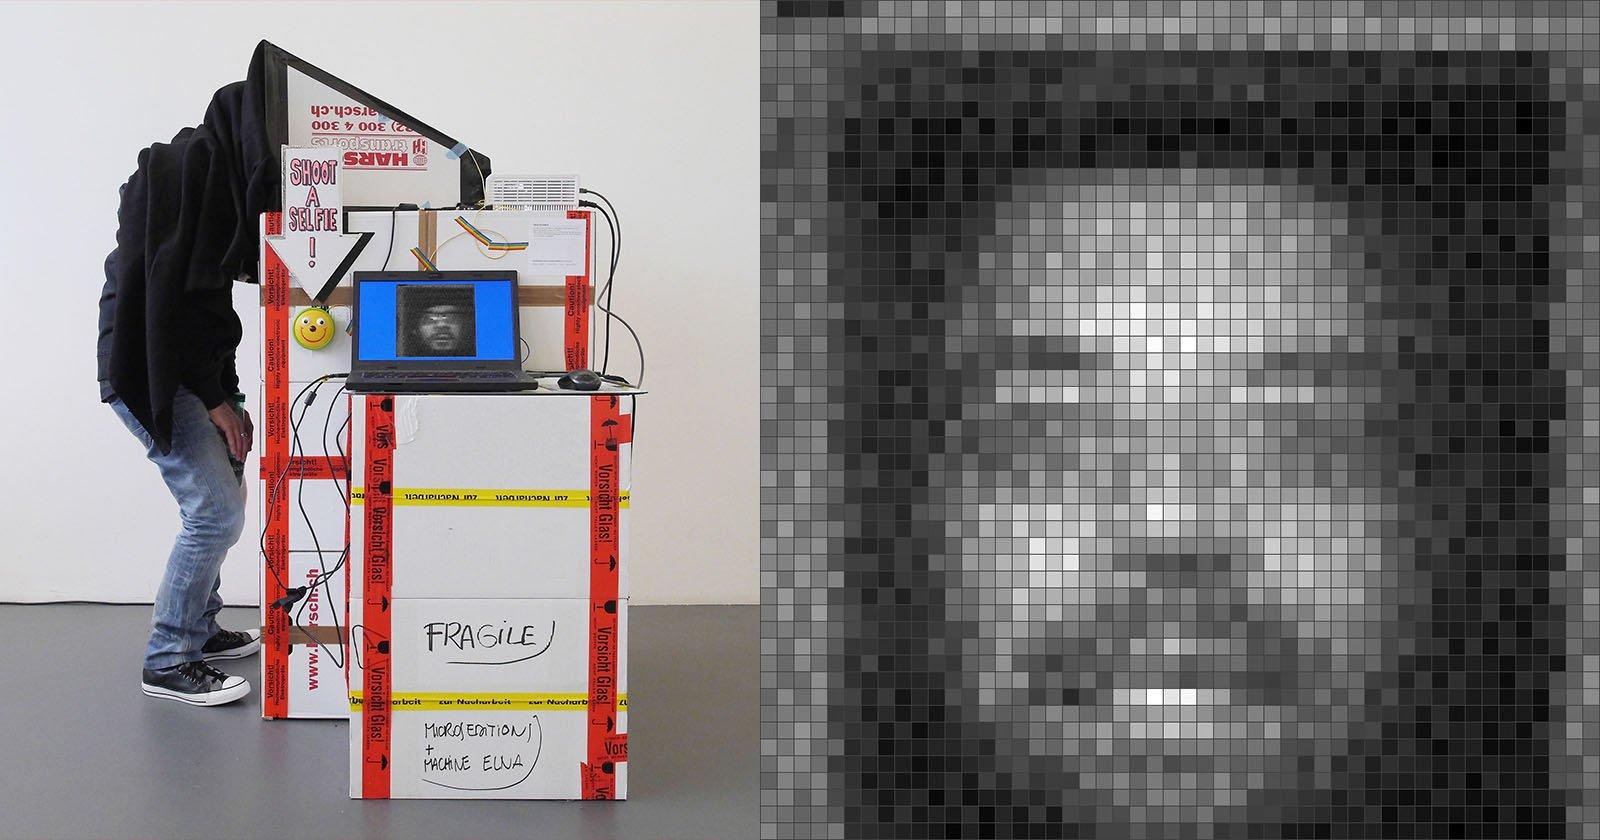 I Built a Kilopixel Camera That Uses a Single Photoresistor for Portraits